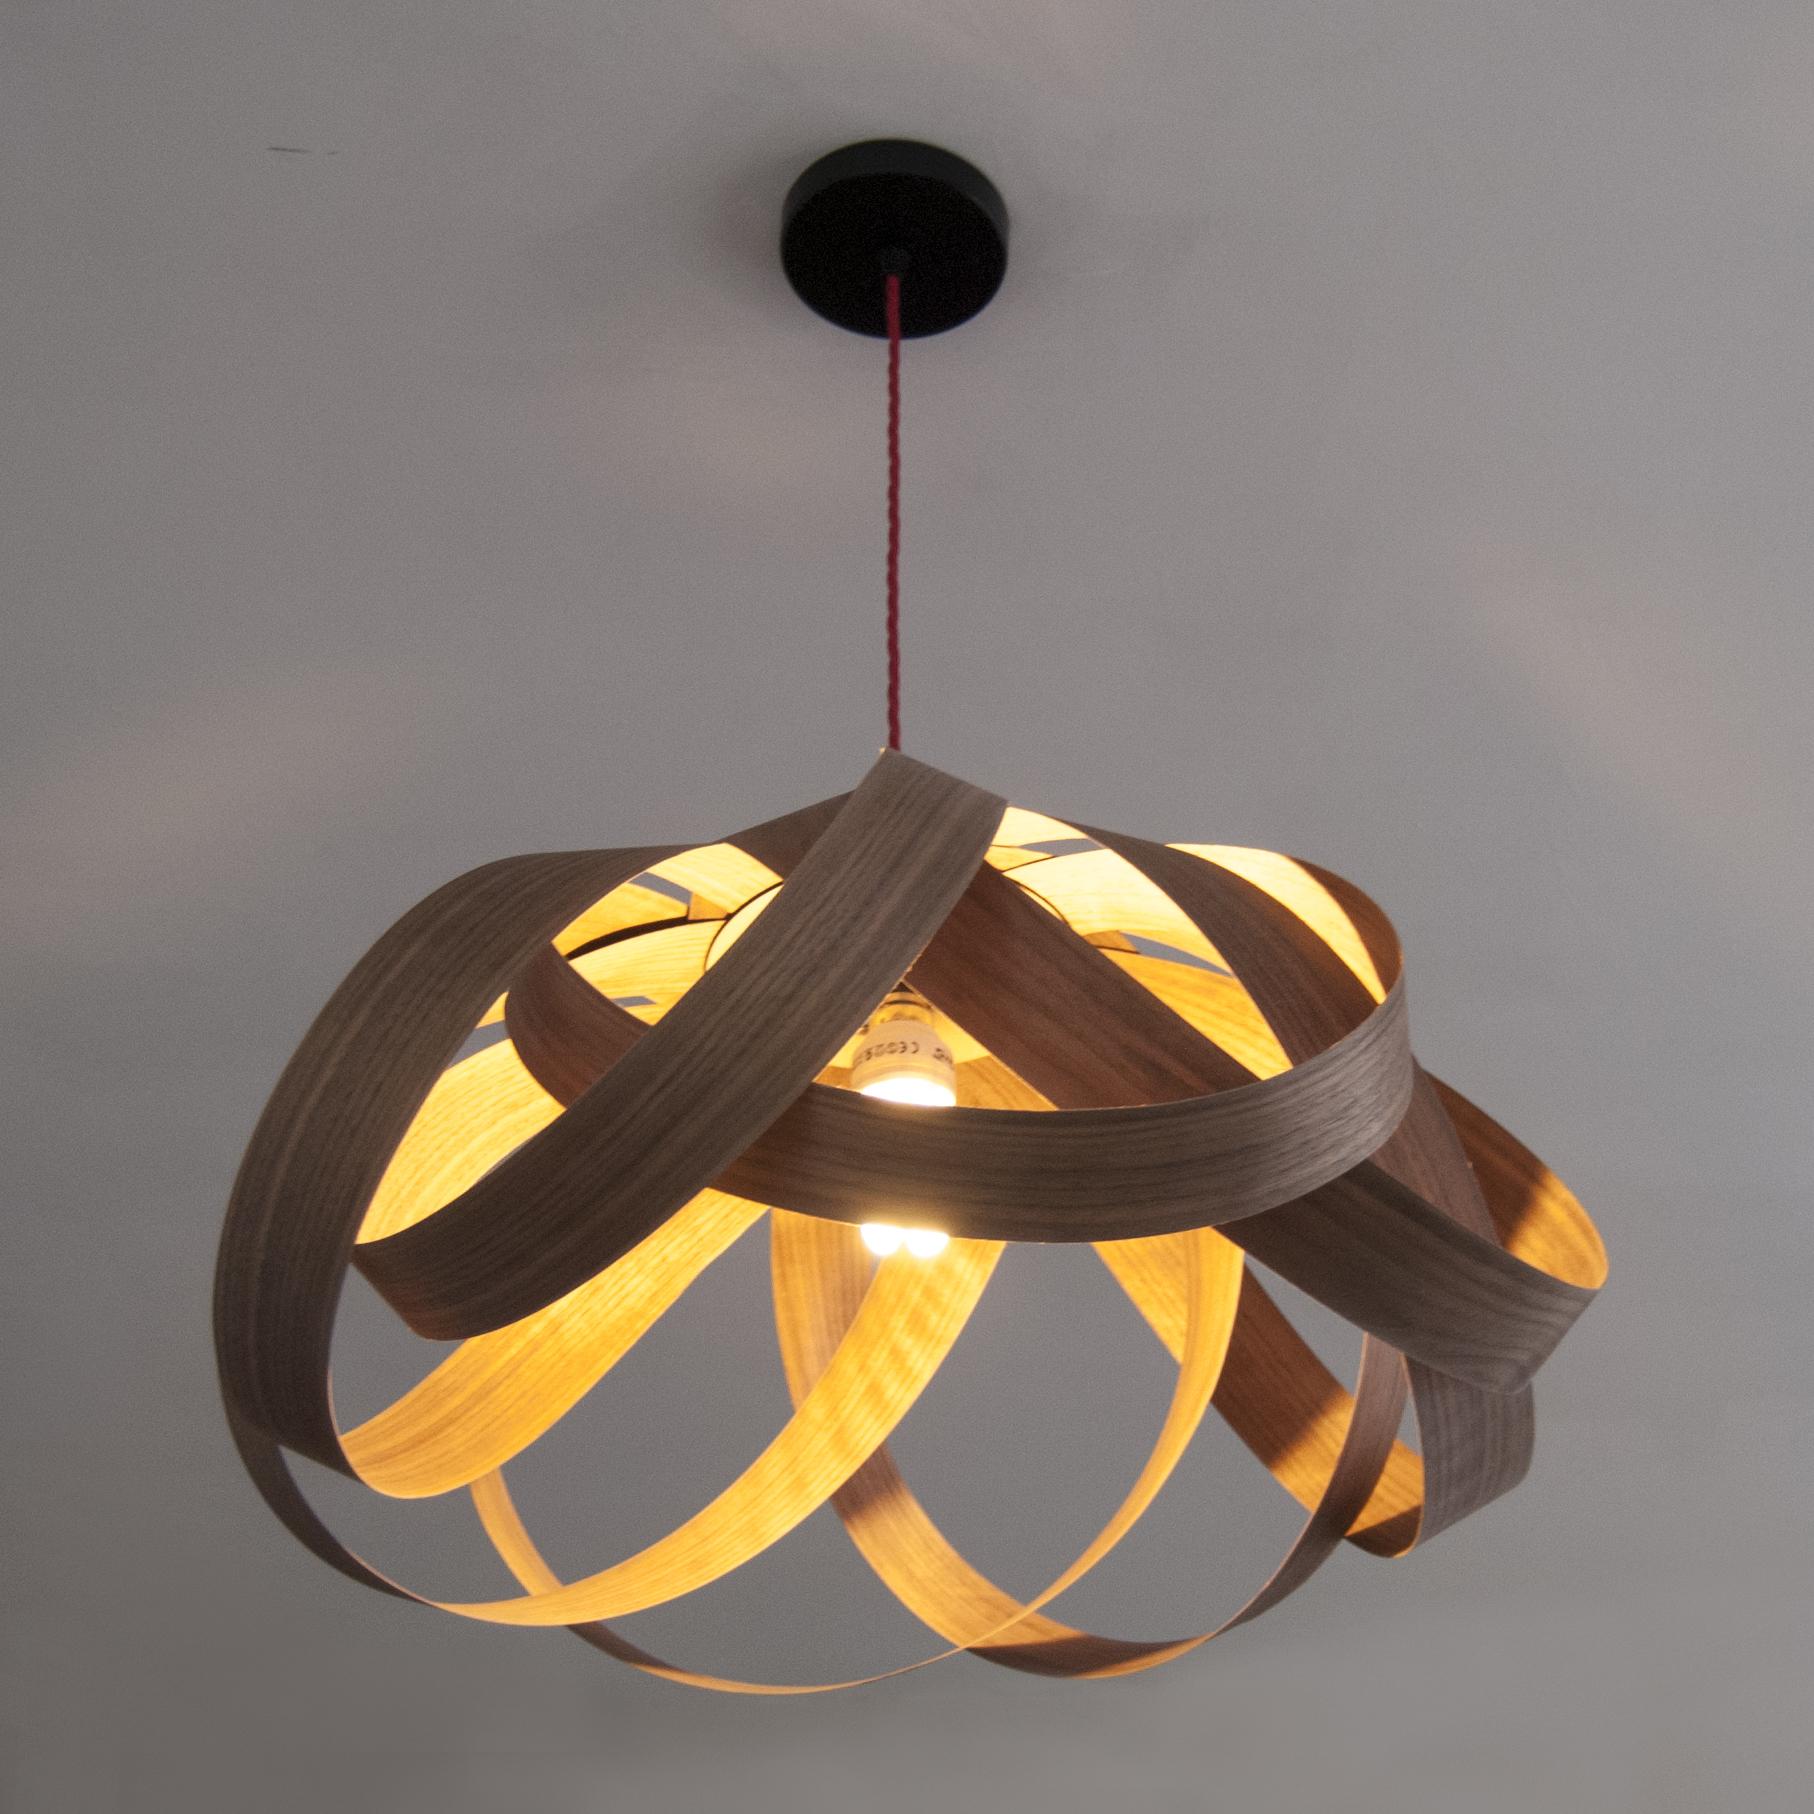 Random lights daisy large lampshade walnut wood previousplaynext aloadofball Choice Image